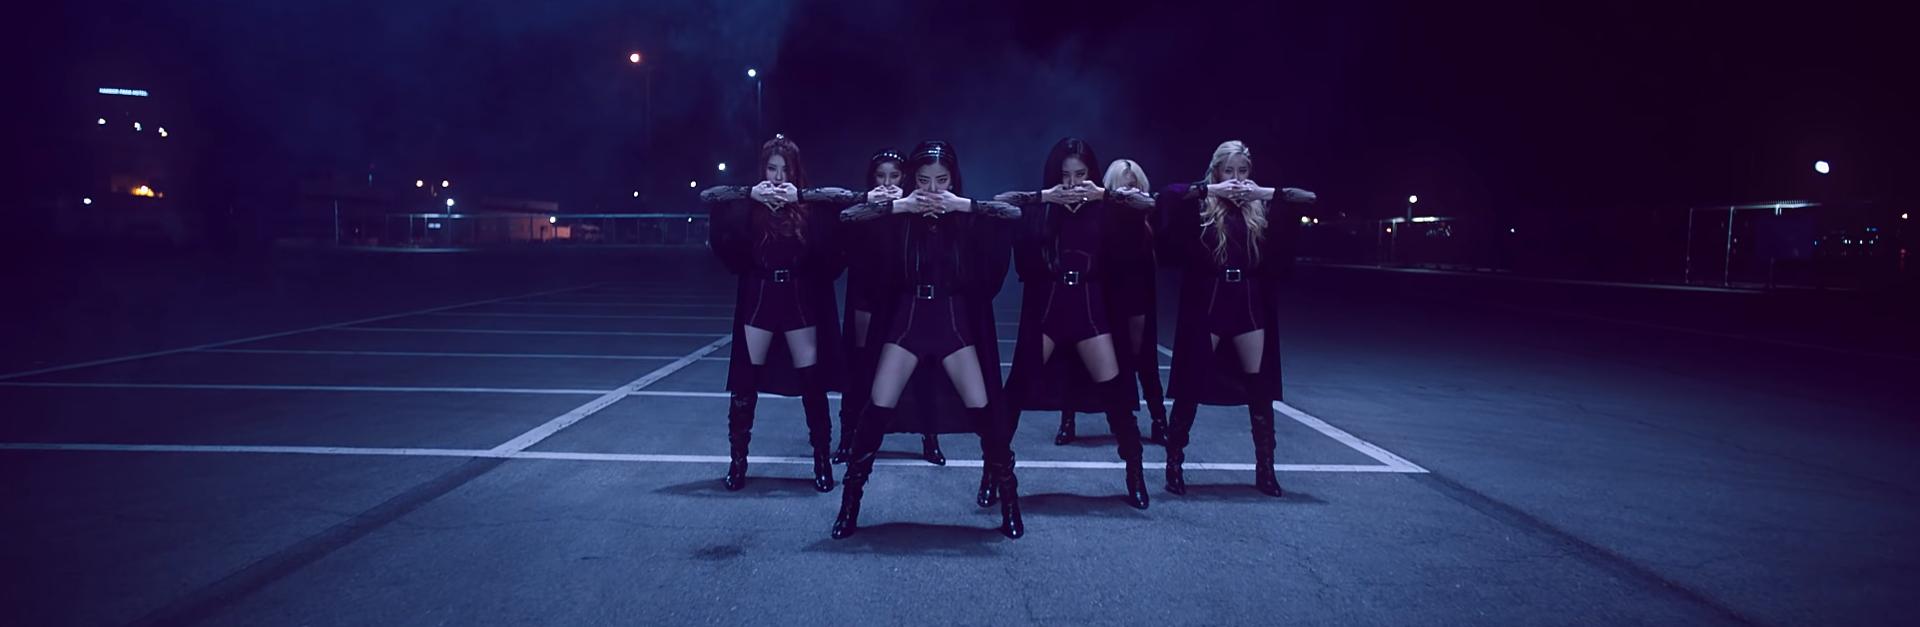 "PURPLE KISS ""My Heart Skips A Beat"" MV"